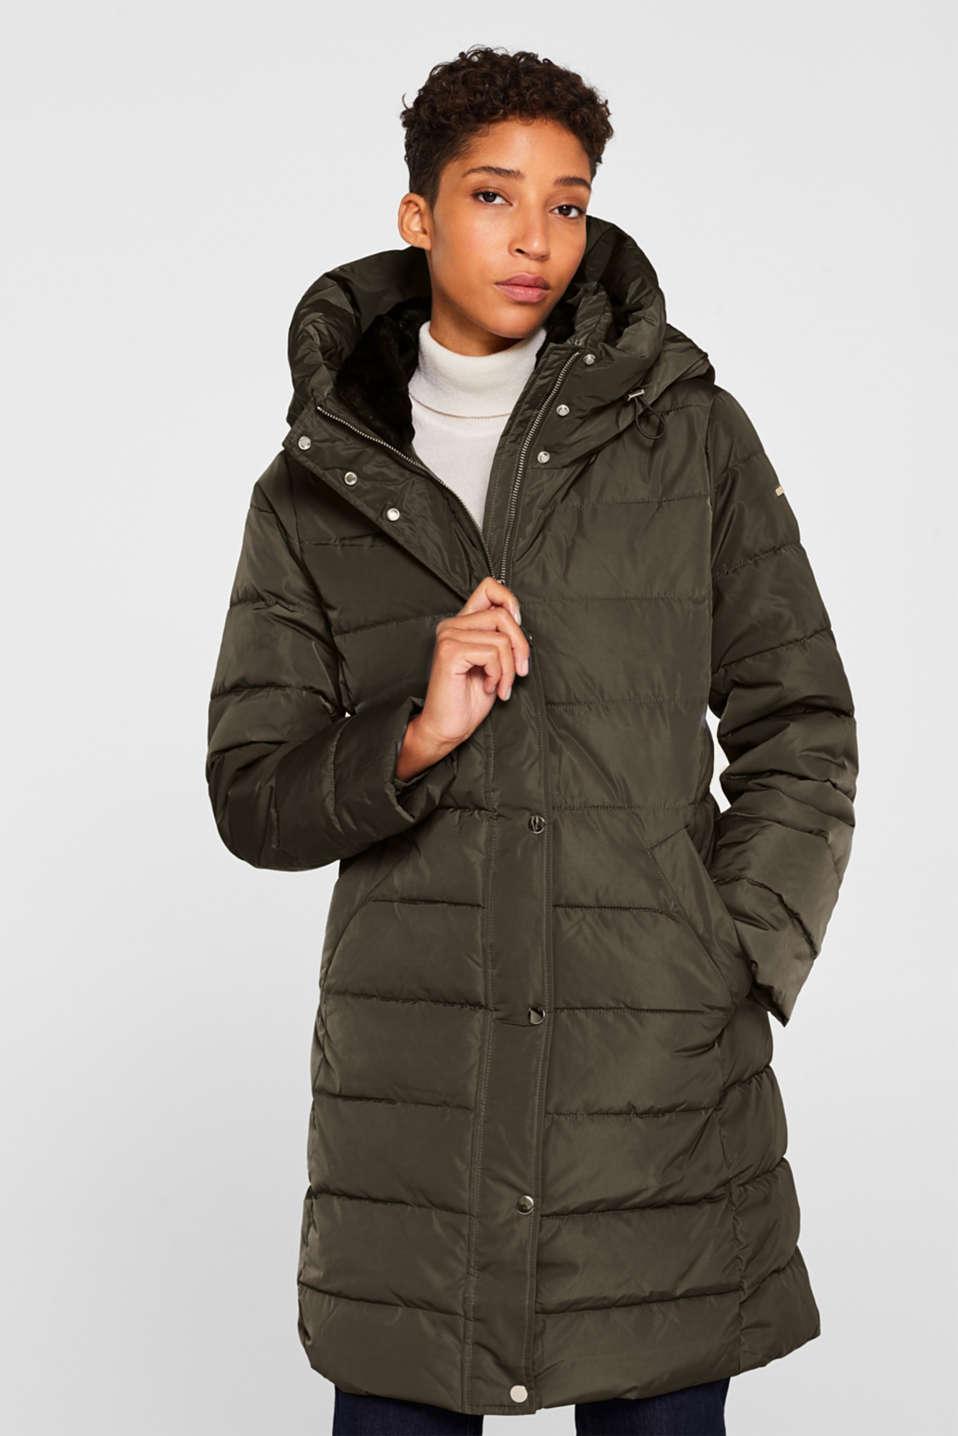 details for buying now size 7 Esprit - Mantel kopen in de online shop